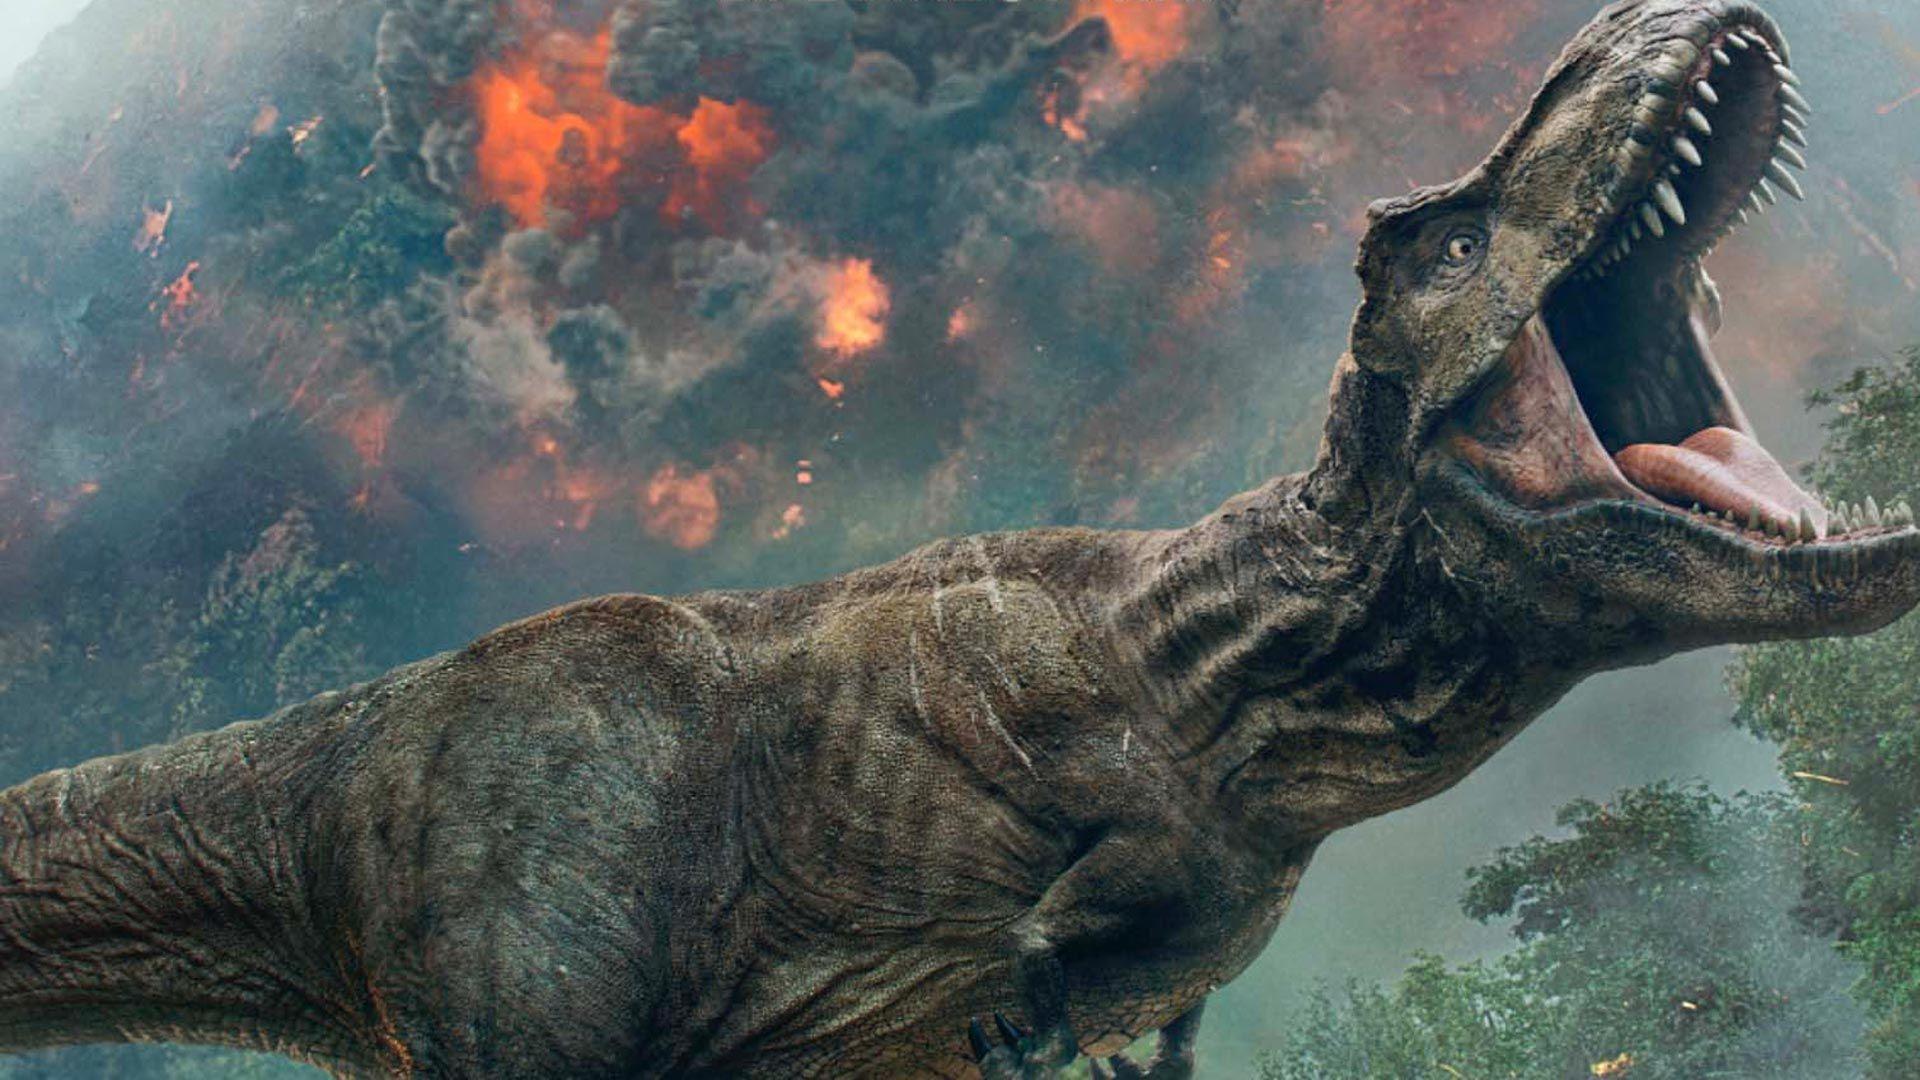 *Watch Jurassic World Fallen Kingdom (2018) FULL MOVIE